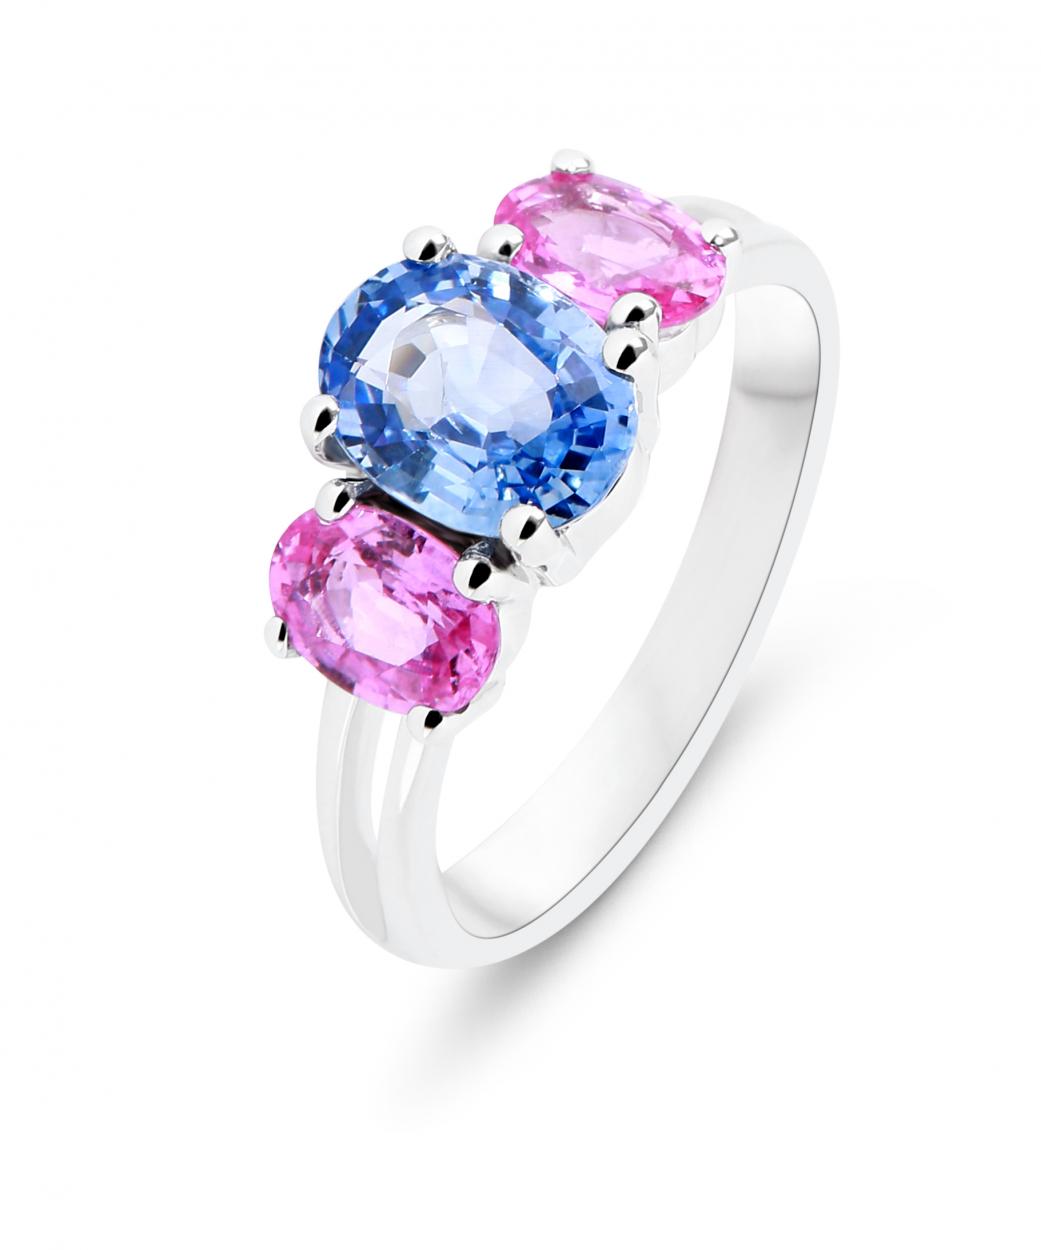 b337ae294a0 Bague Trilogie Or Blanc 750 Saphir Bleu et Saphir rose Ref. 46547